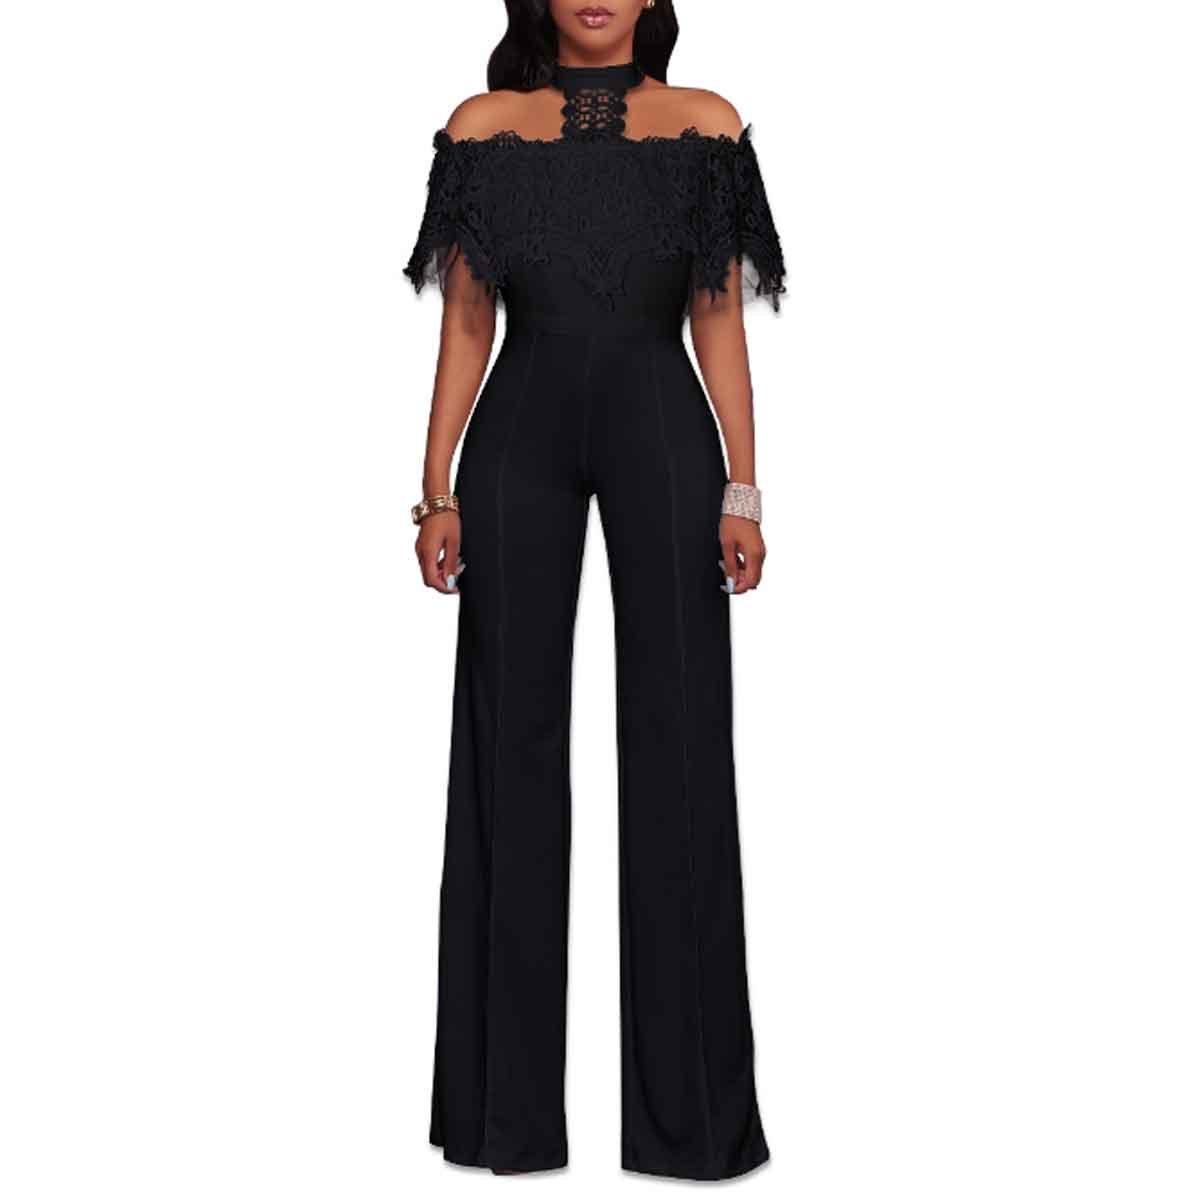 e70341a8f02 Amazon.com  HELIDA Womens Off Shoulder Lace Halter High Waist Wide Leg Pants  Jumpsuit Romper  Clothing